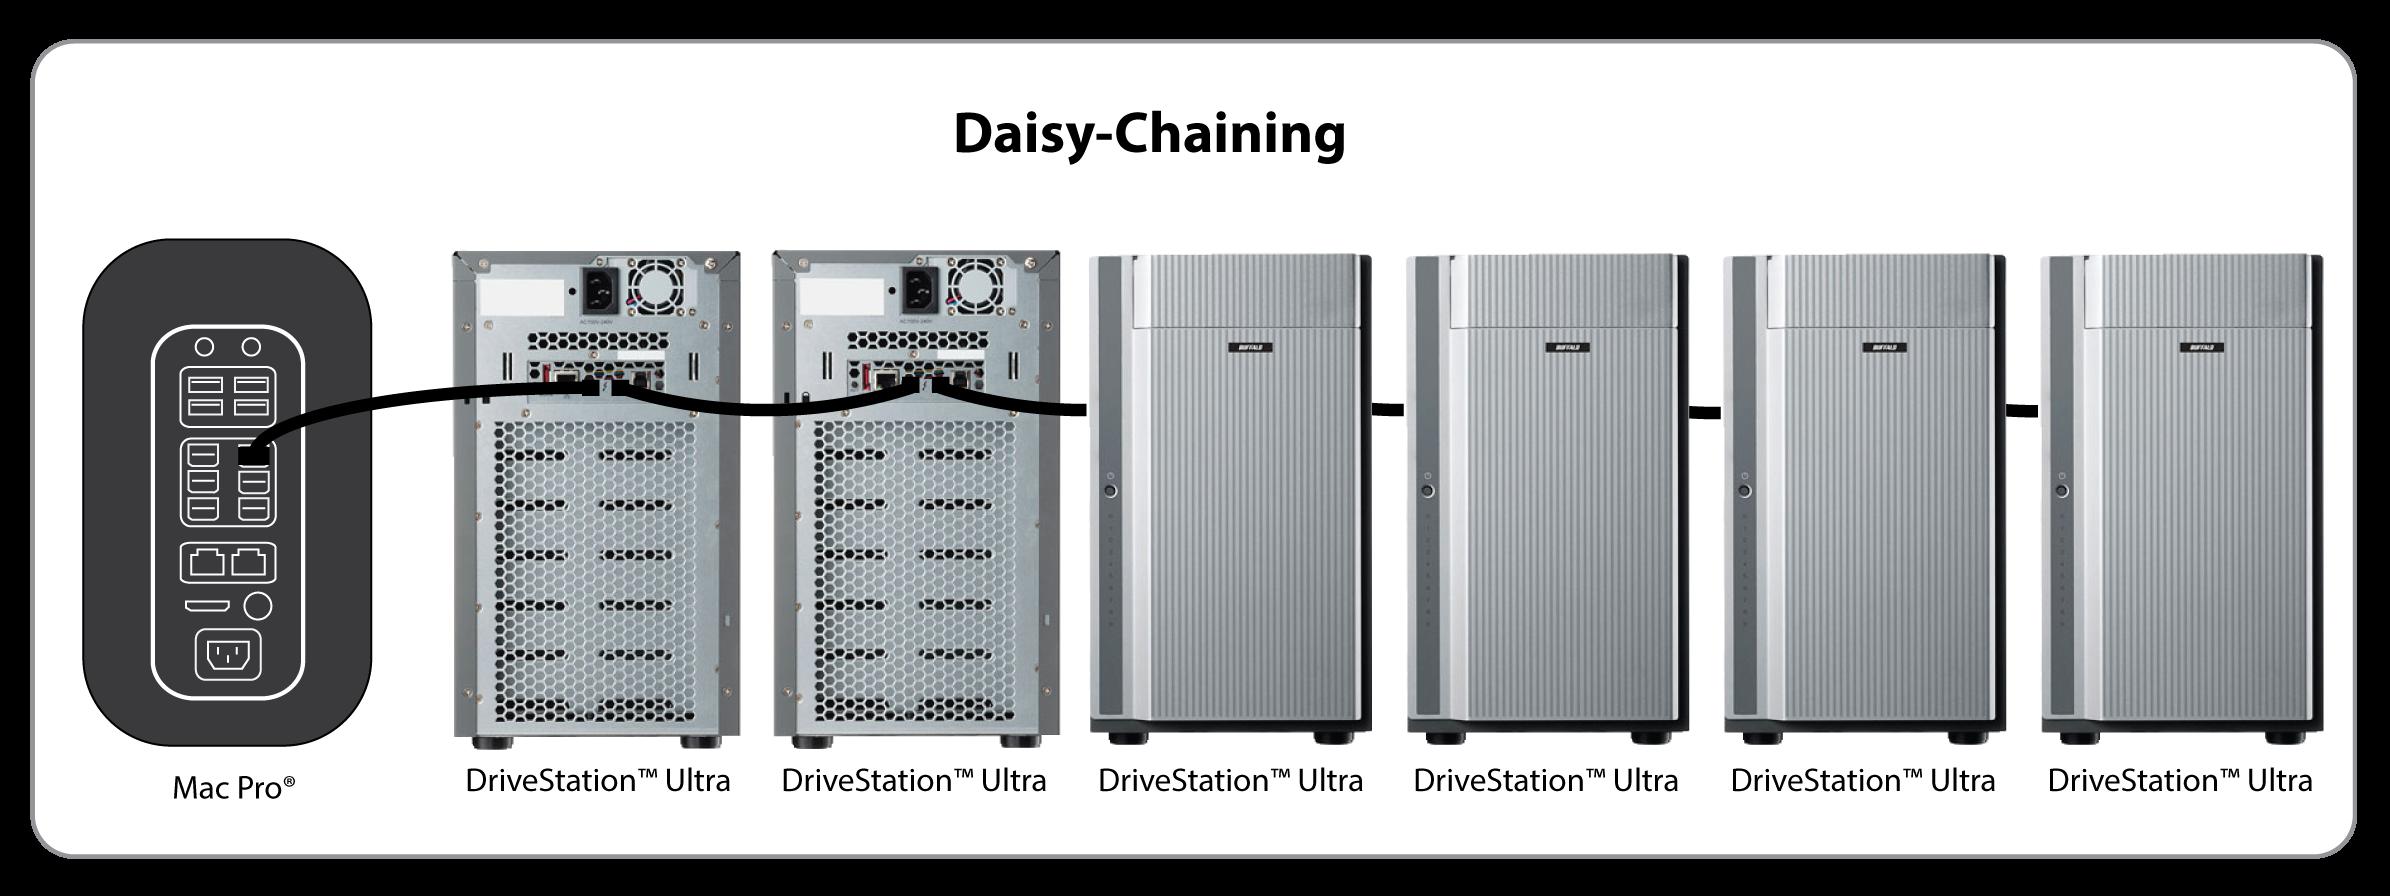 Drivestation Ultra Buffalo Americas Daisy Chain Wiring Home Phone Highlights